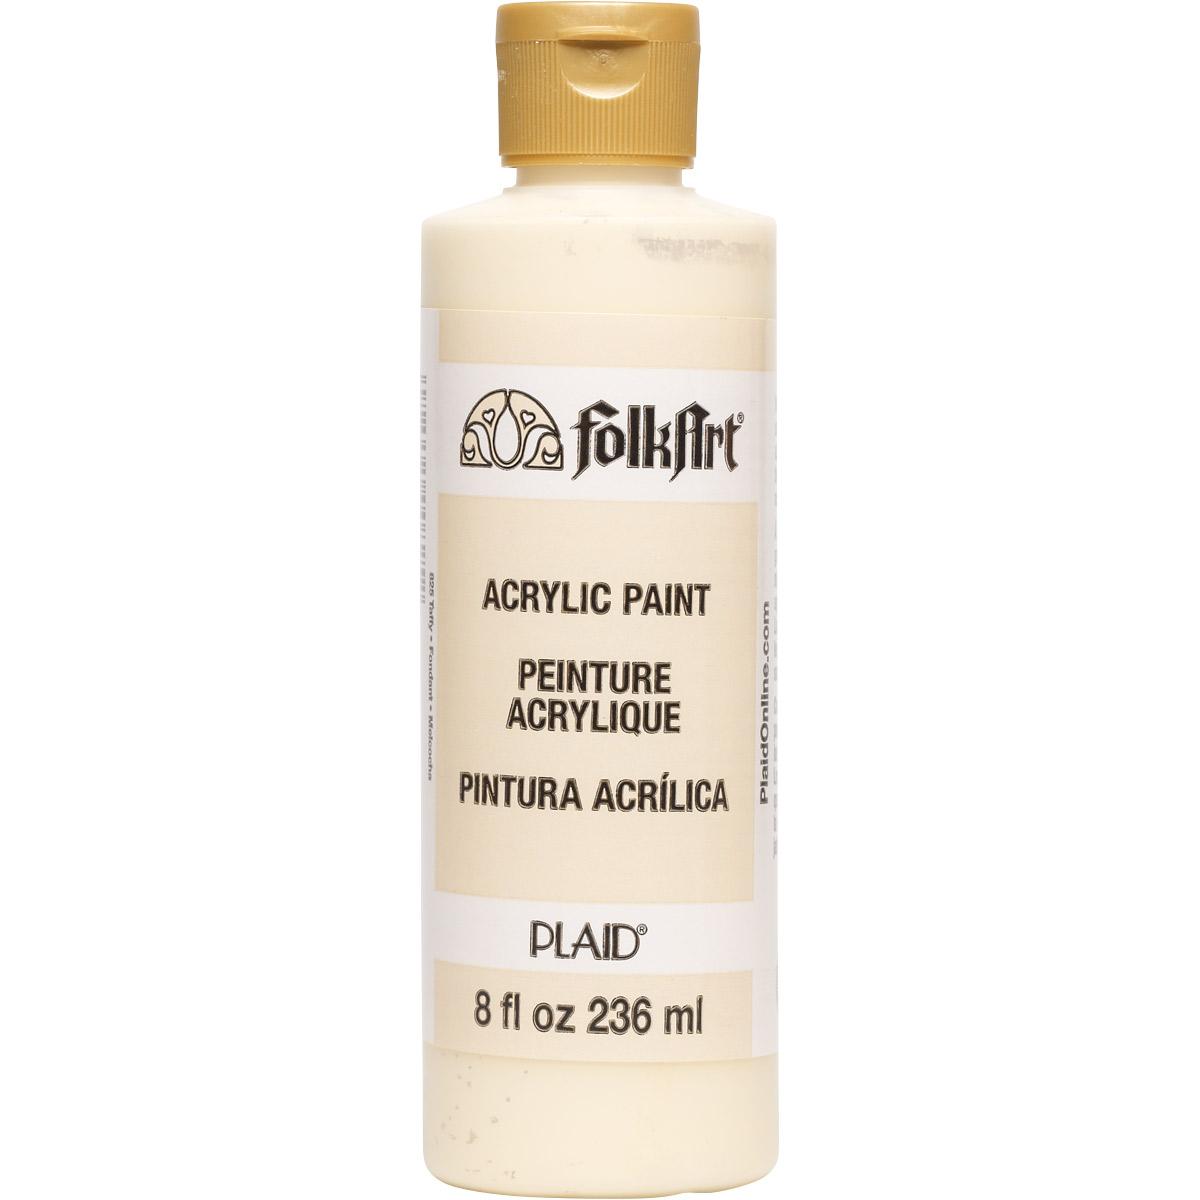 FolkArt ® Acrylic Colors - Taffy, 8 oz.